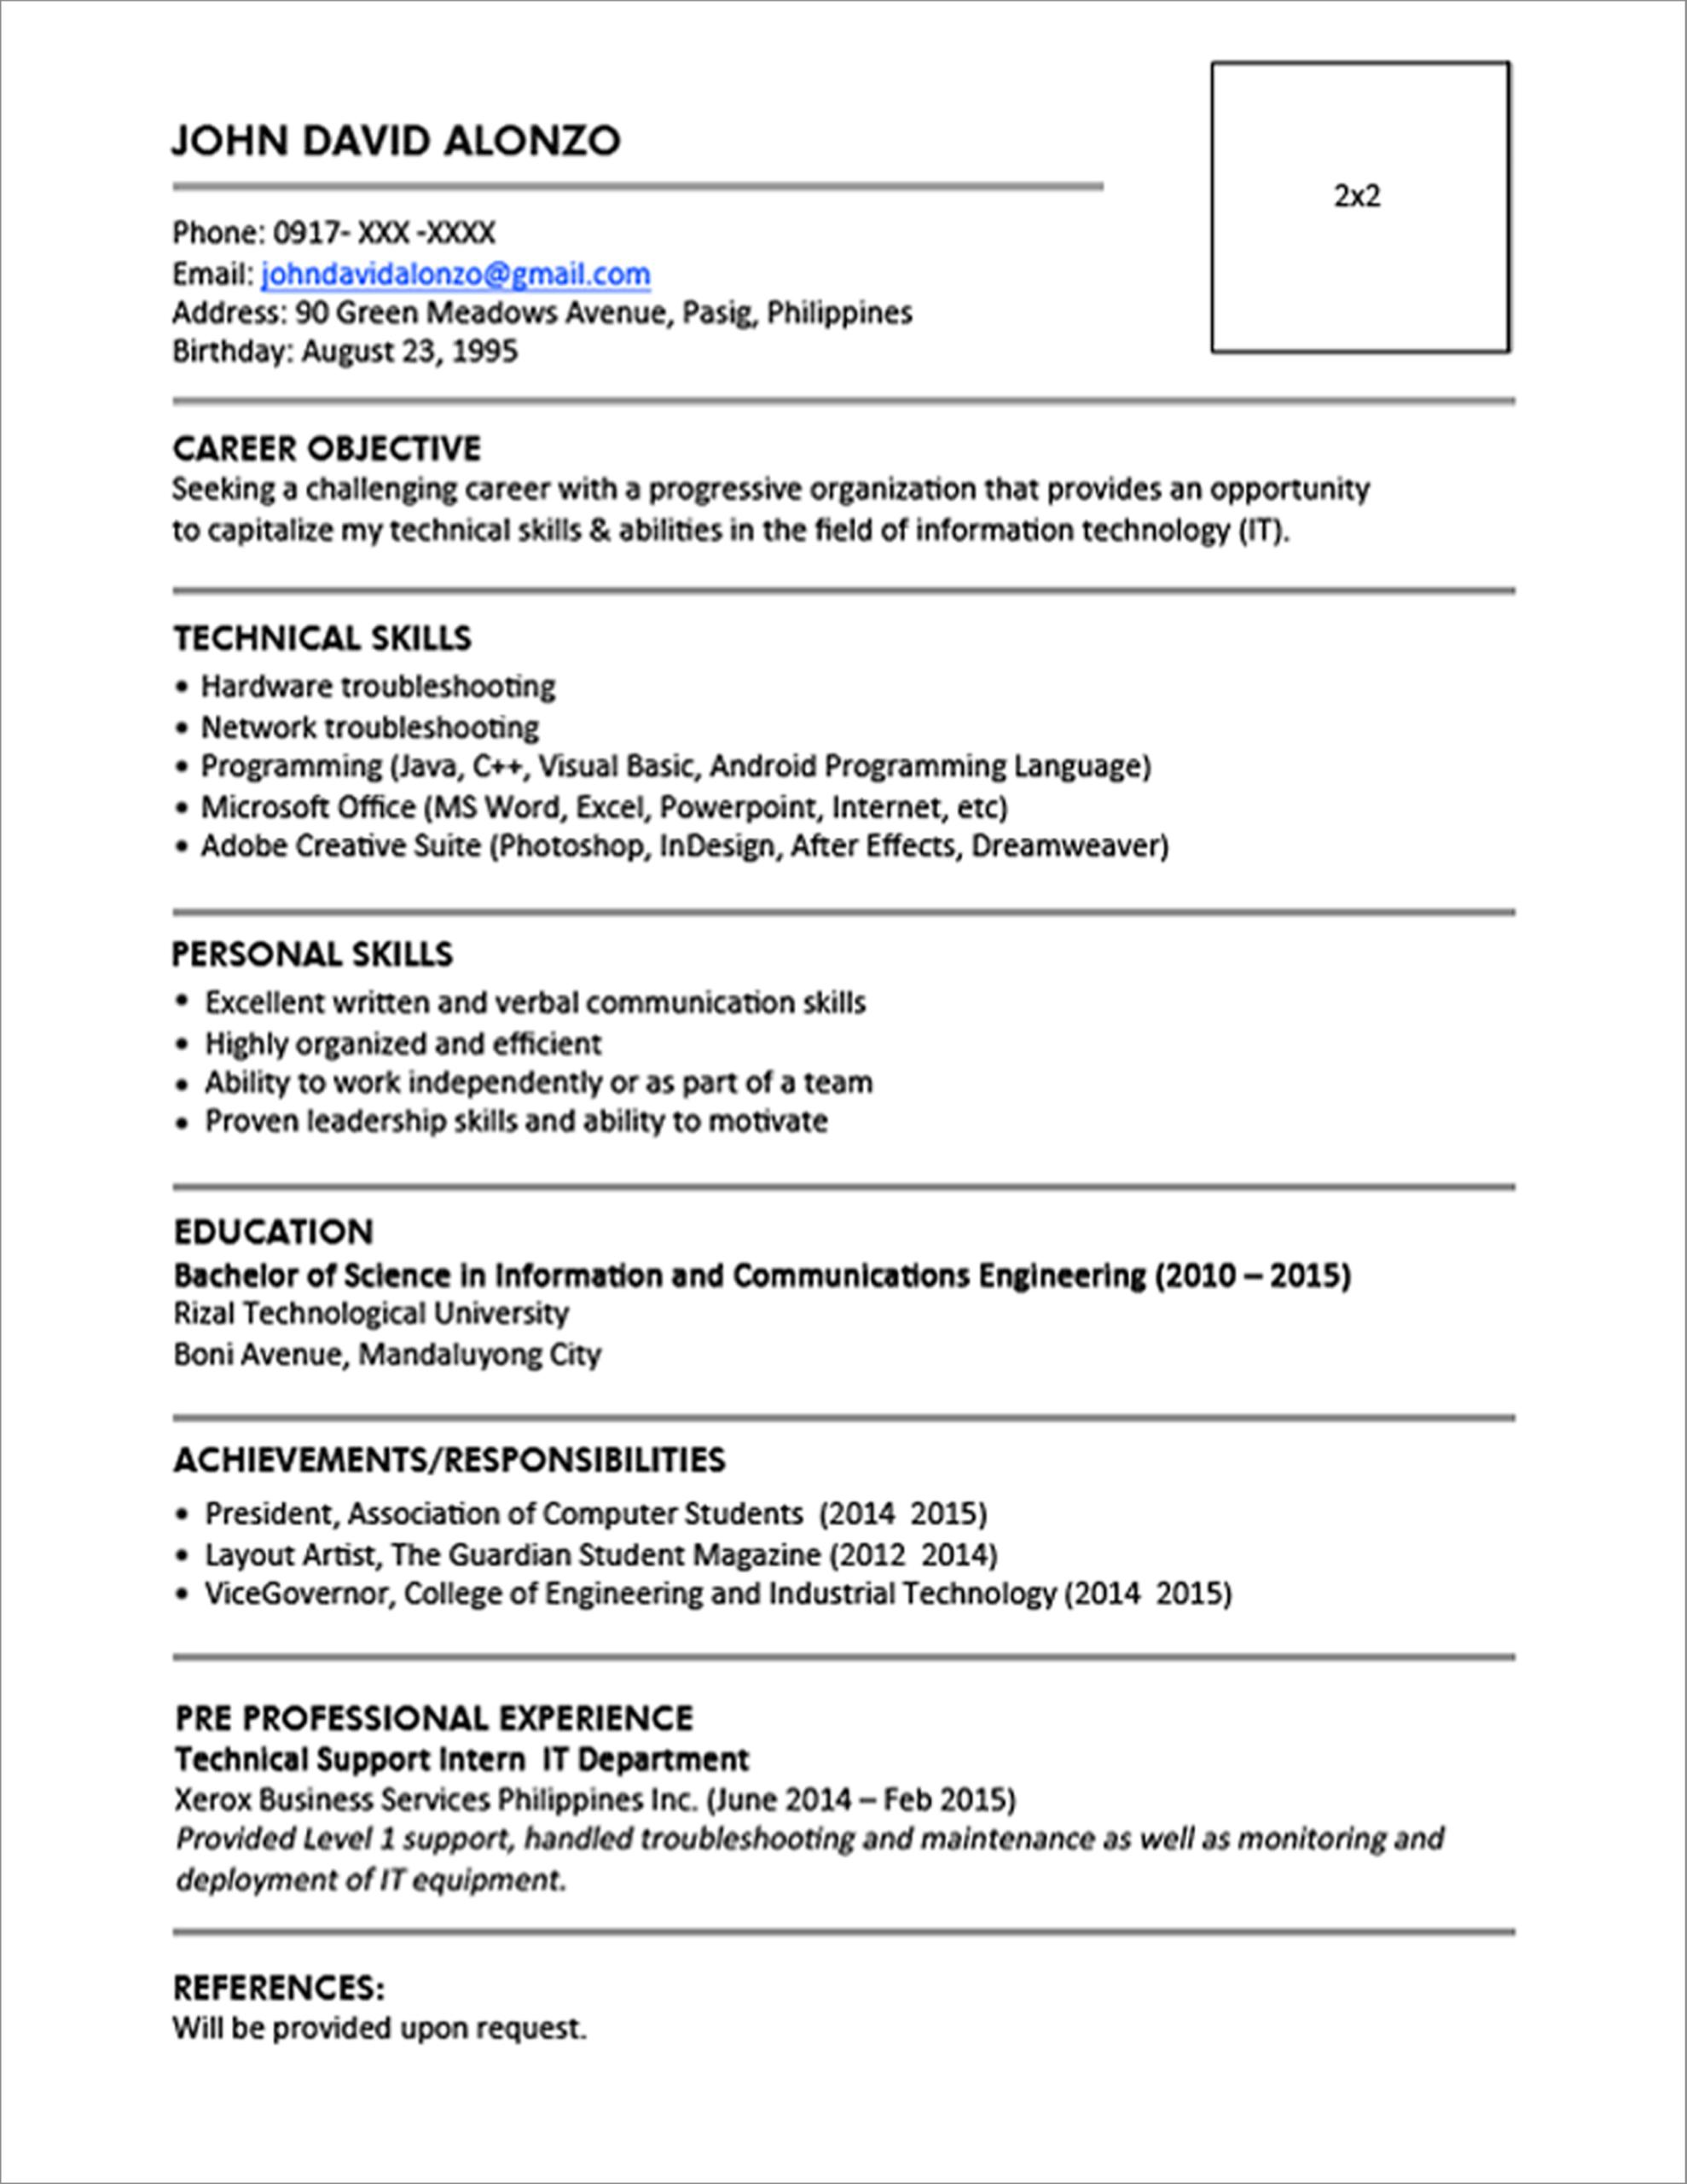 Fresh Graduate Cv Template – Karati.ald2014 Intended For College Student Resume Template Microsoft Word